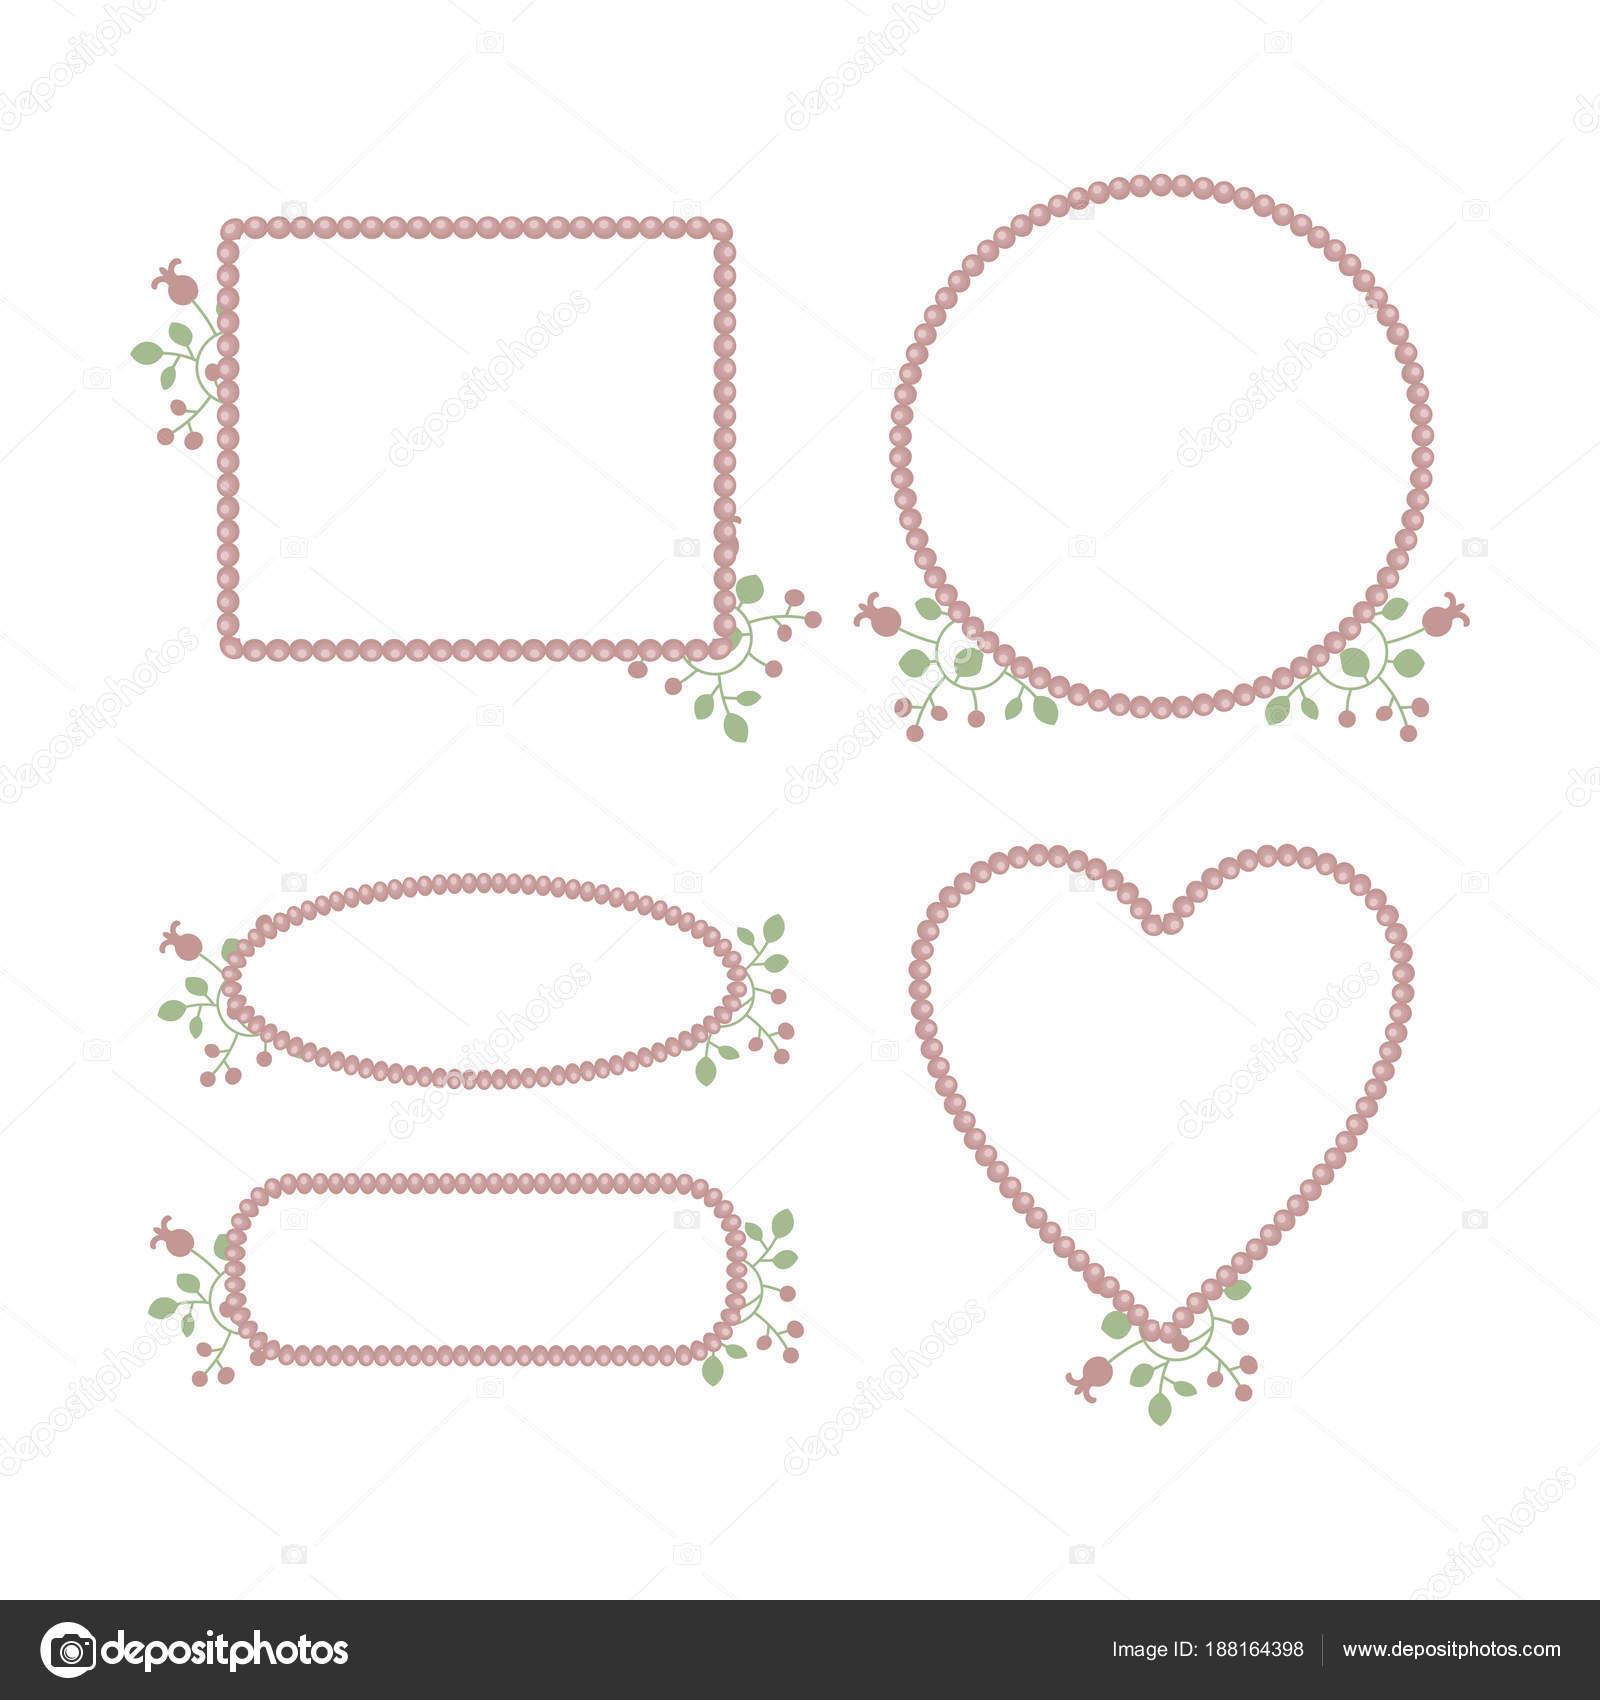 Rosa süße zarte Prinzessin Perle Rahmen mit floralen Mustern ...